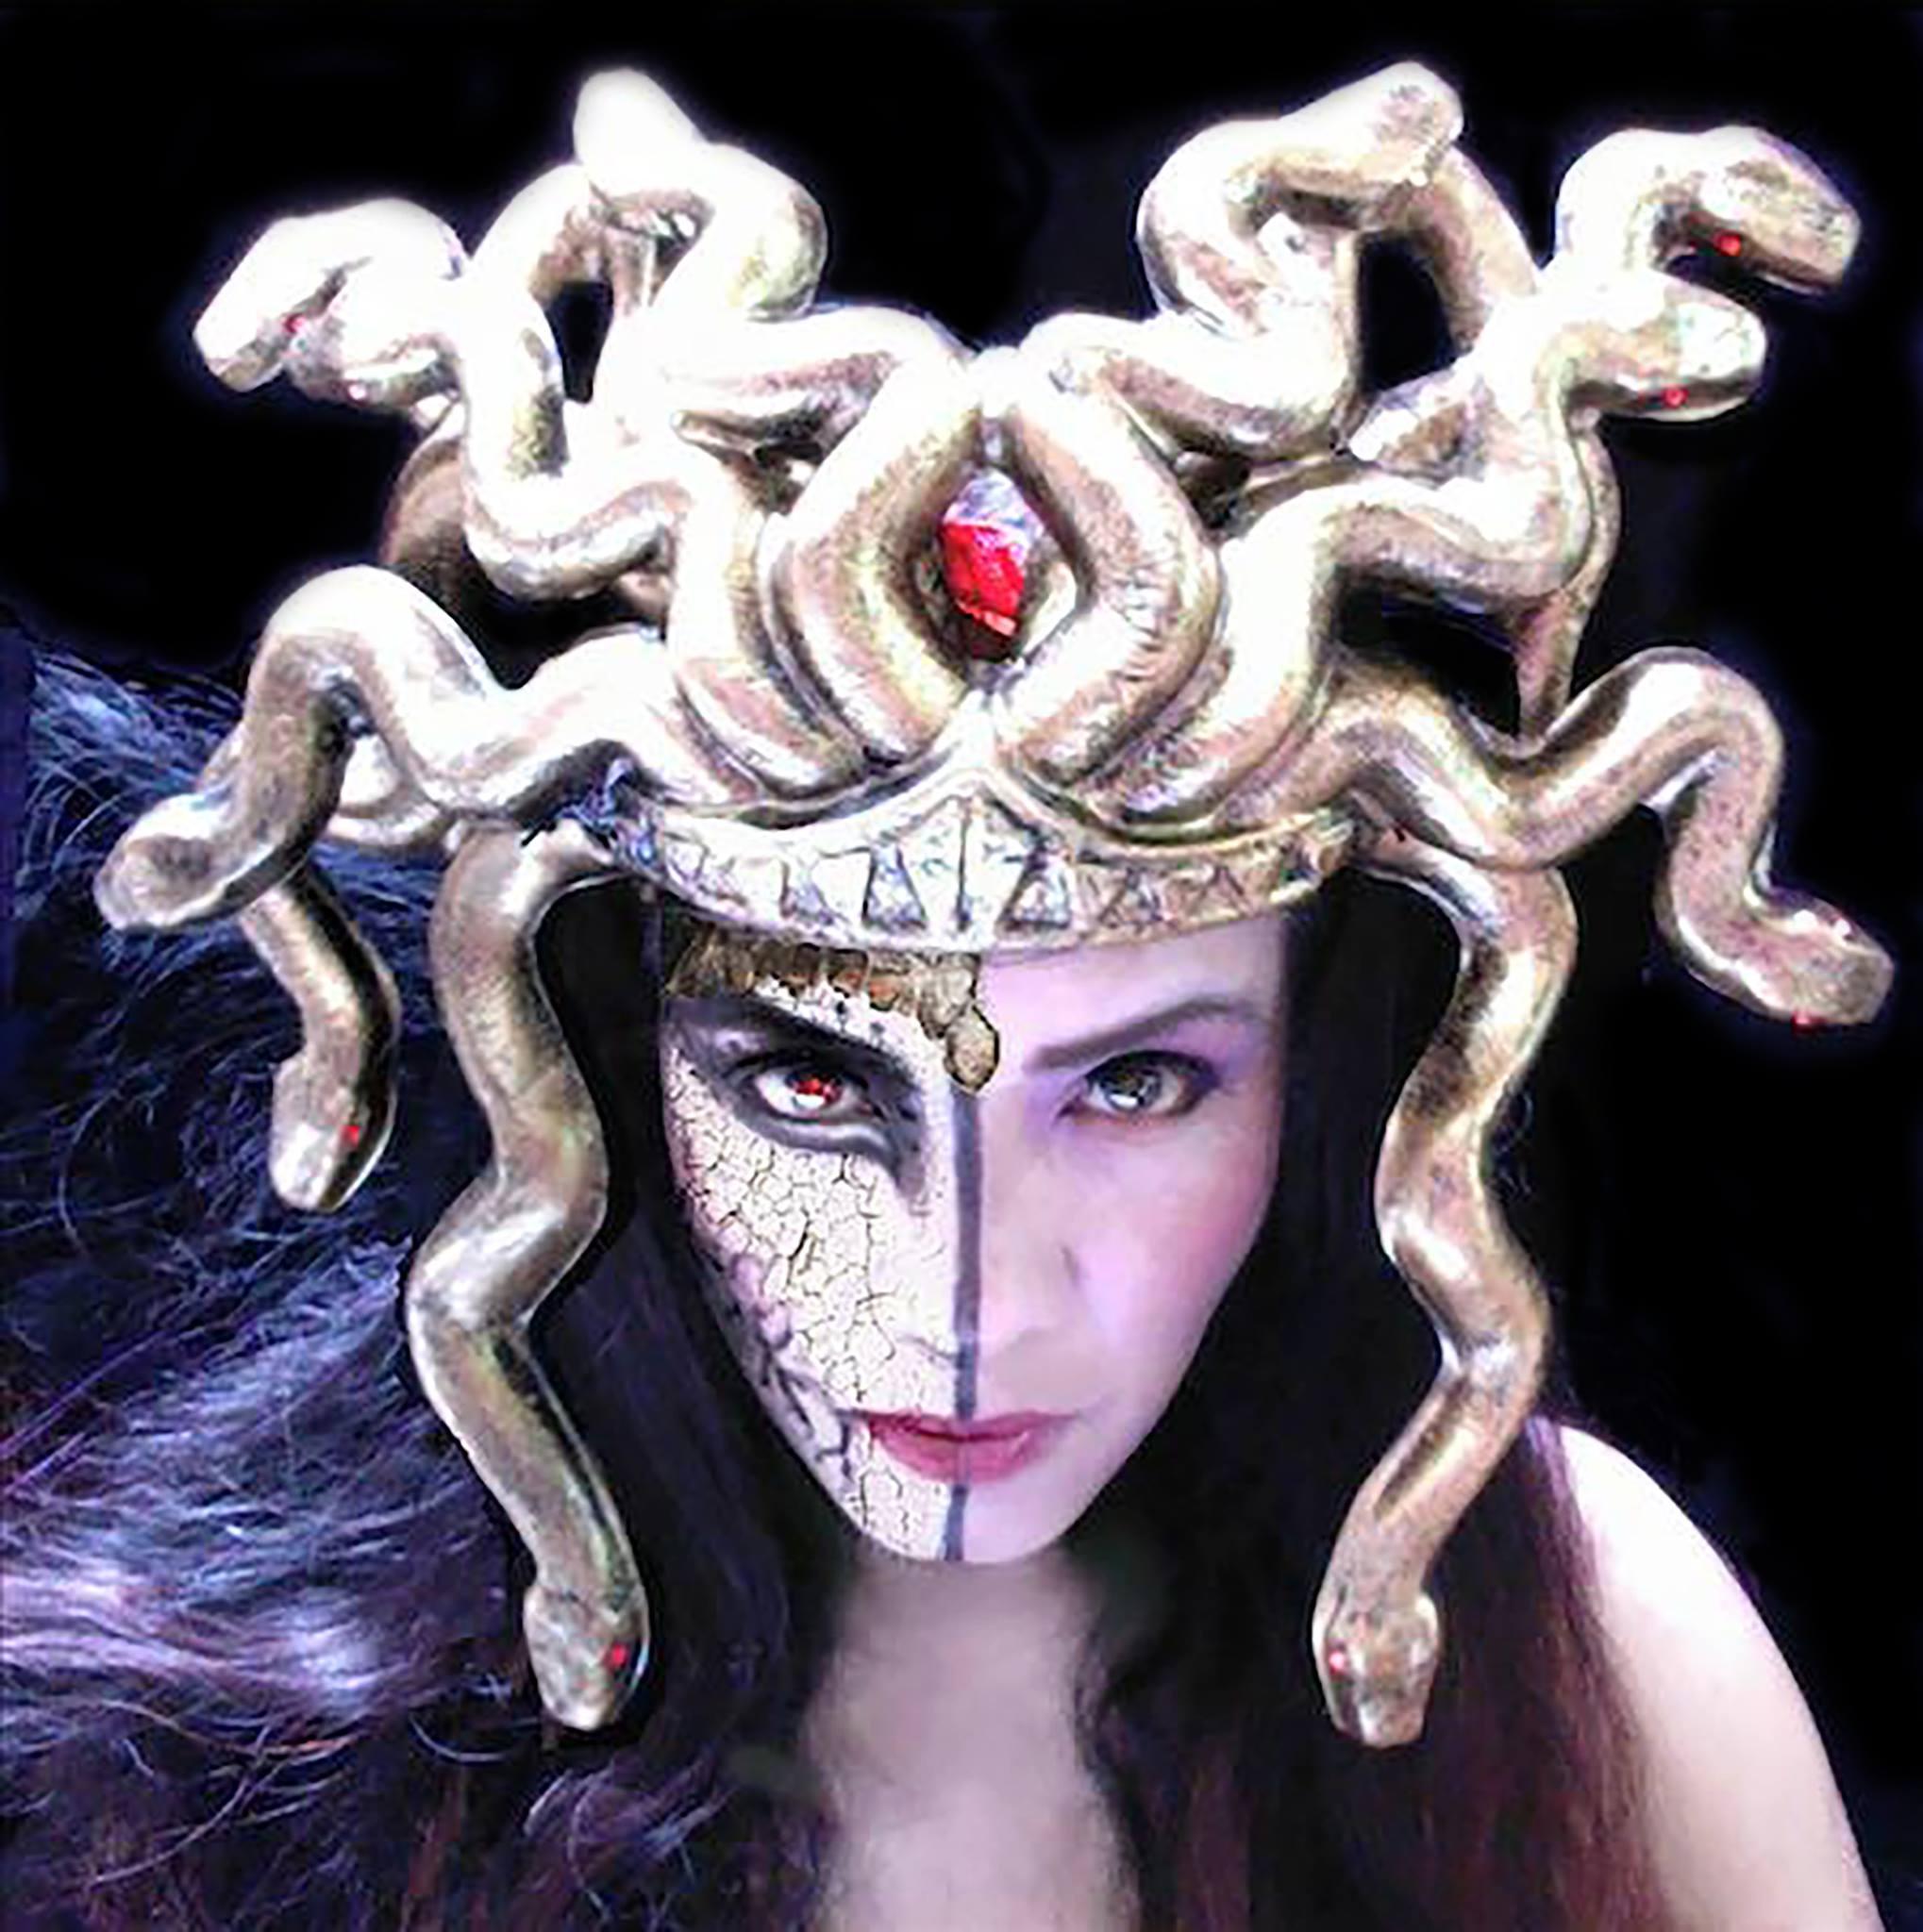 90's Porn Film Medusa Goddess dark nights — kumu kahua theatre